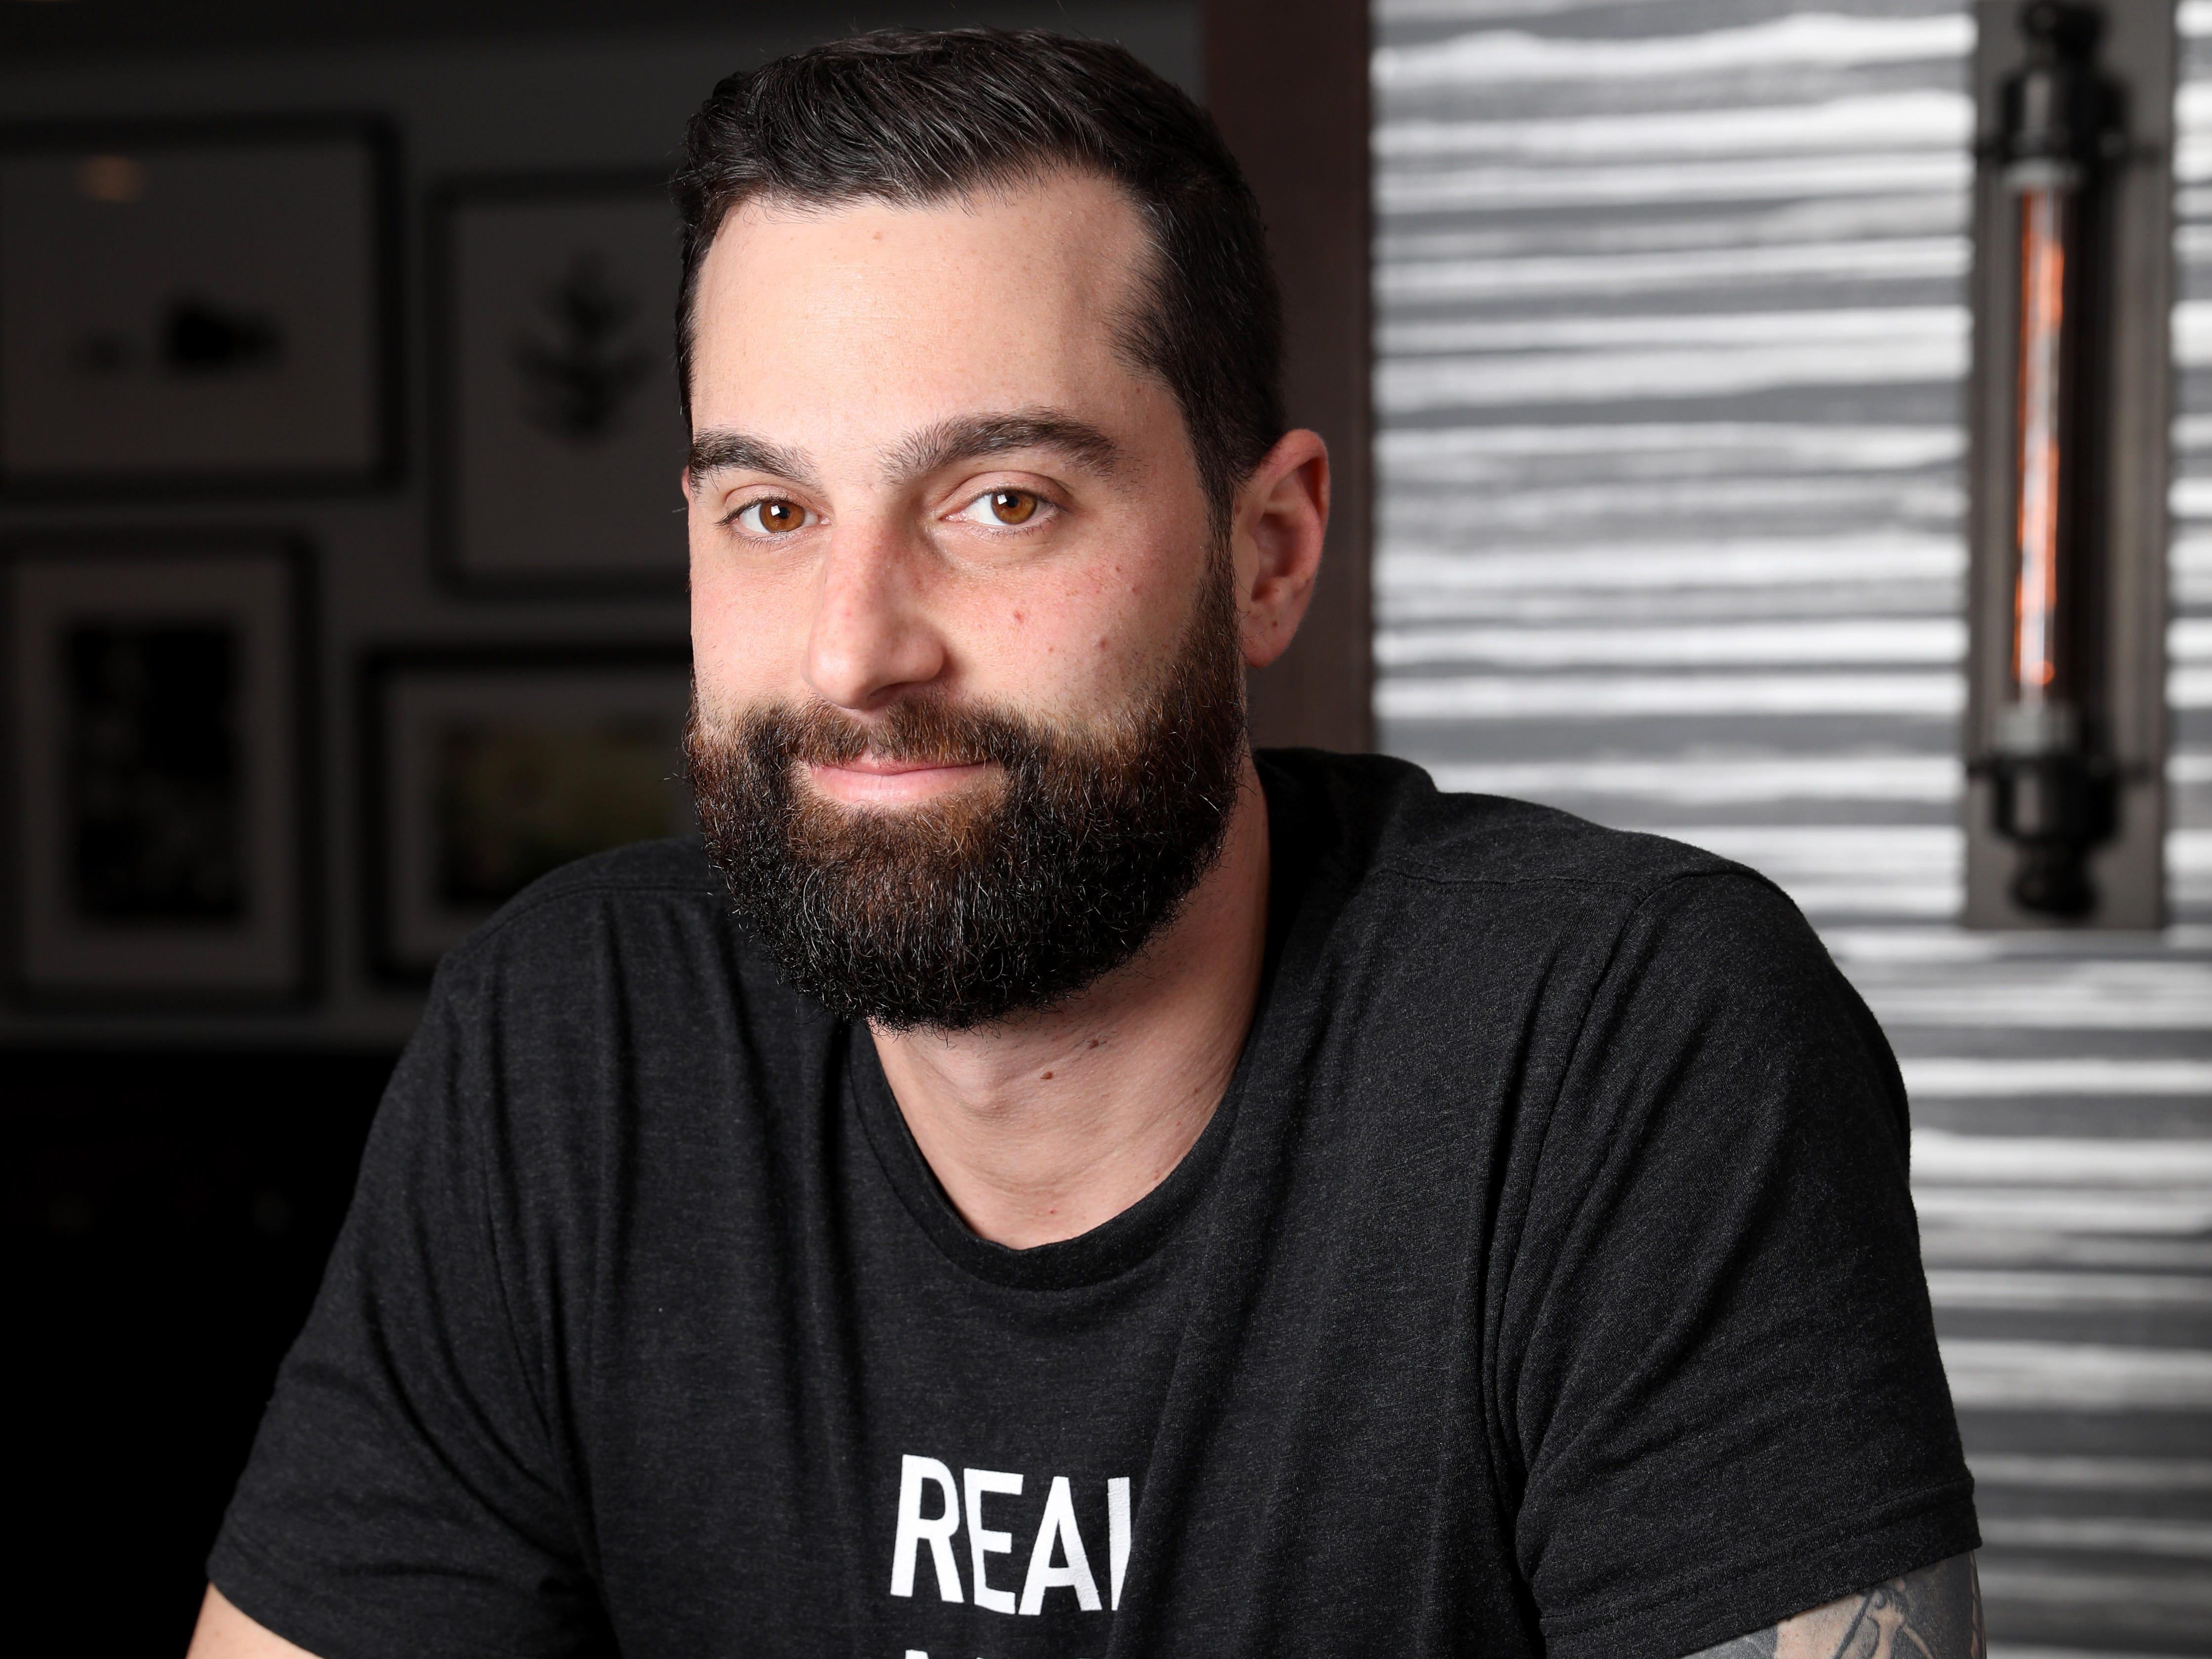 Chef Matthew Safarowic, operator of The Whitlock in Katonah March 14, 2019. Safarowic has about 10 tattoos.